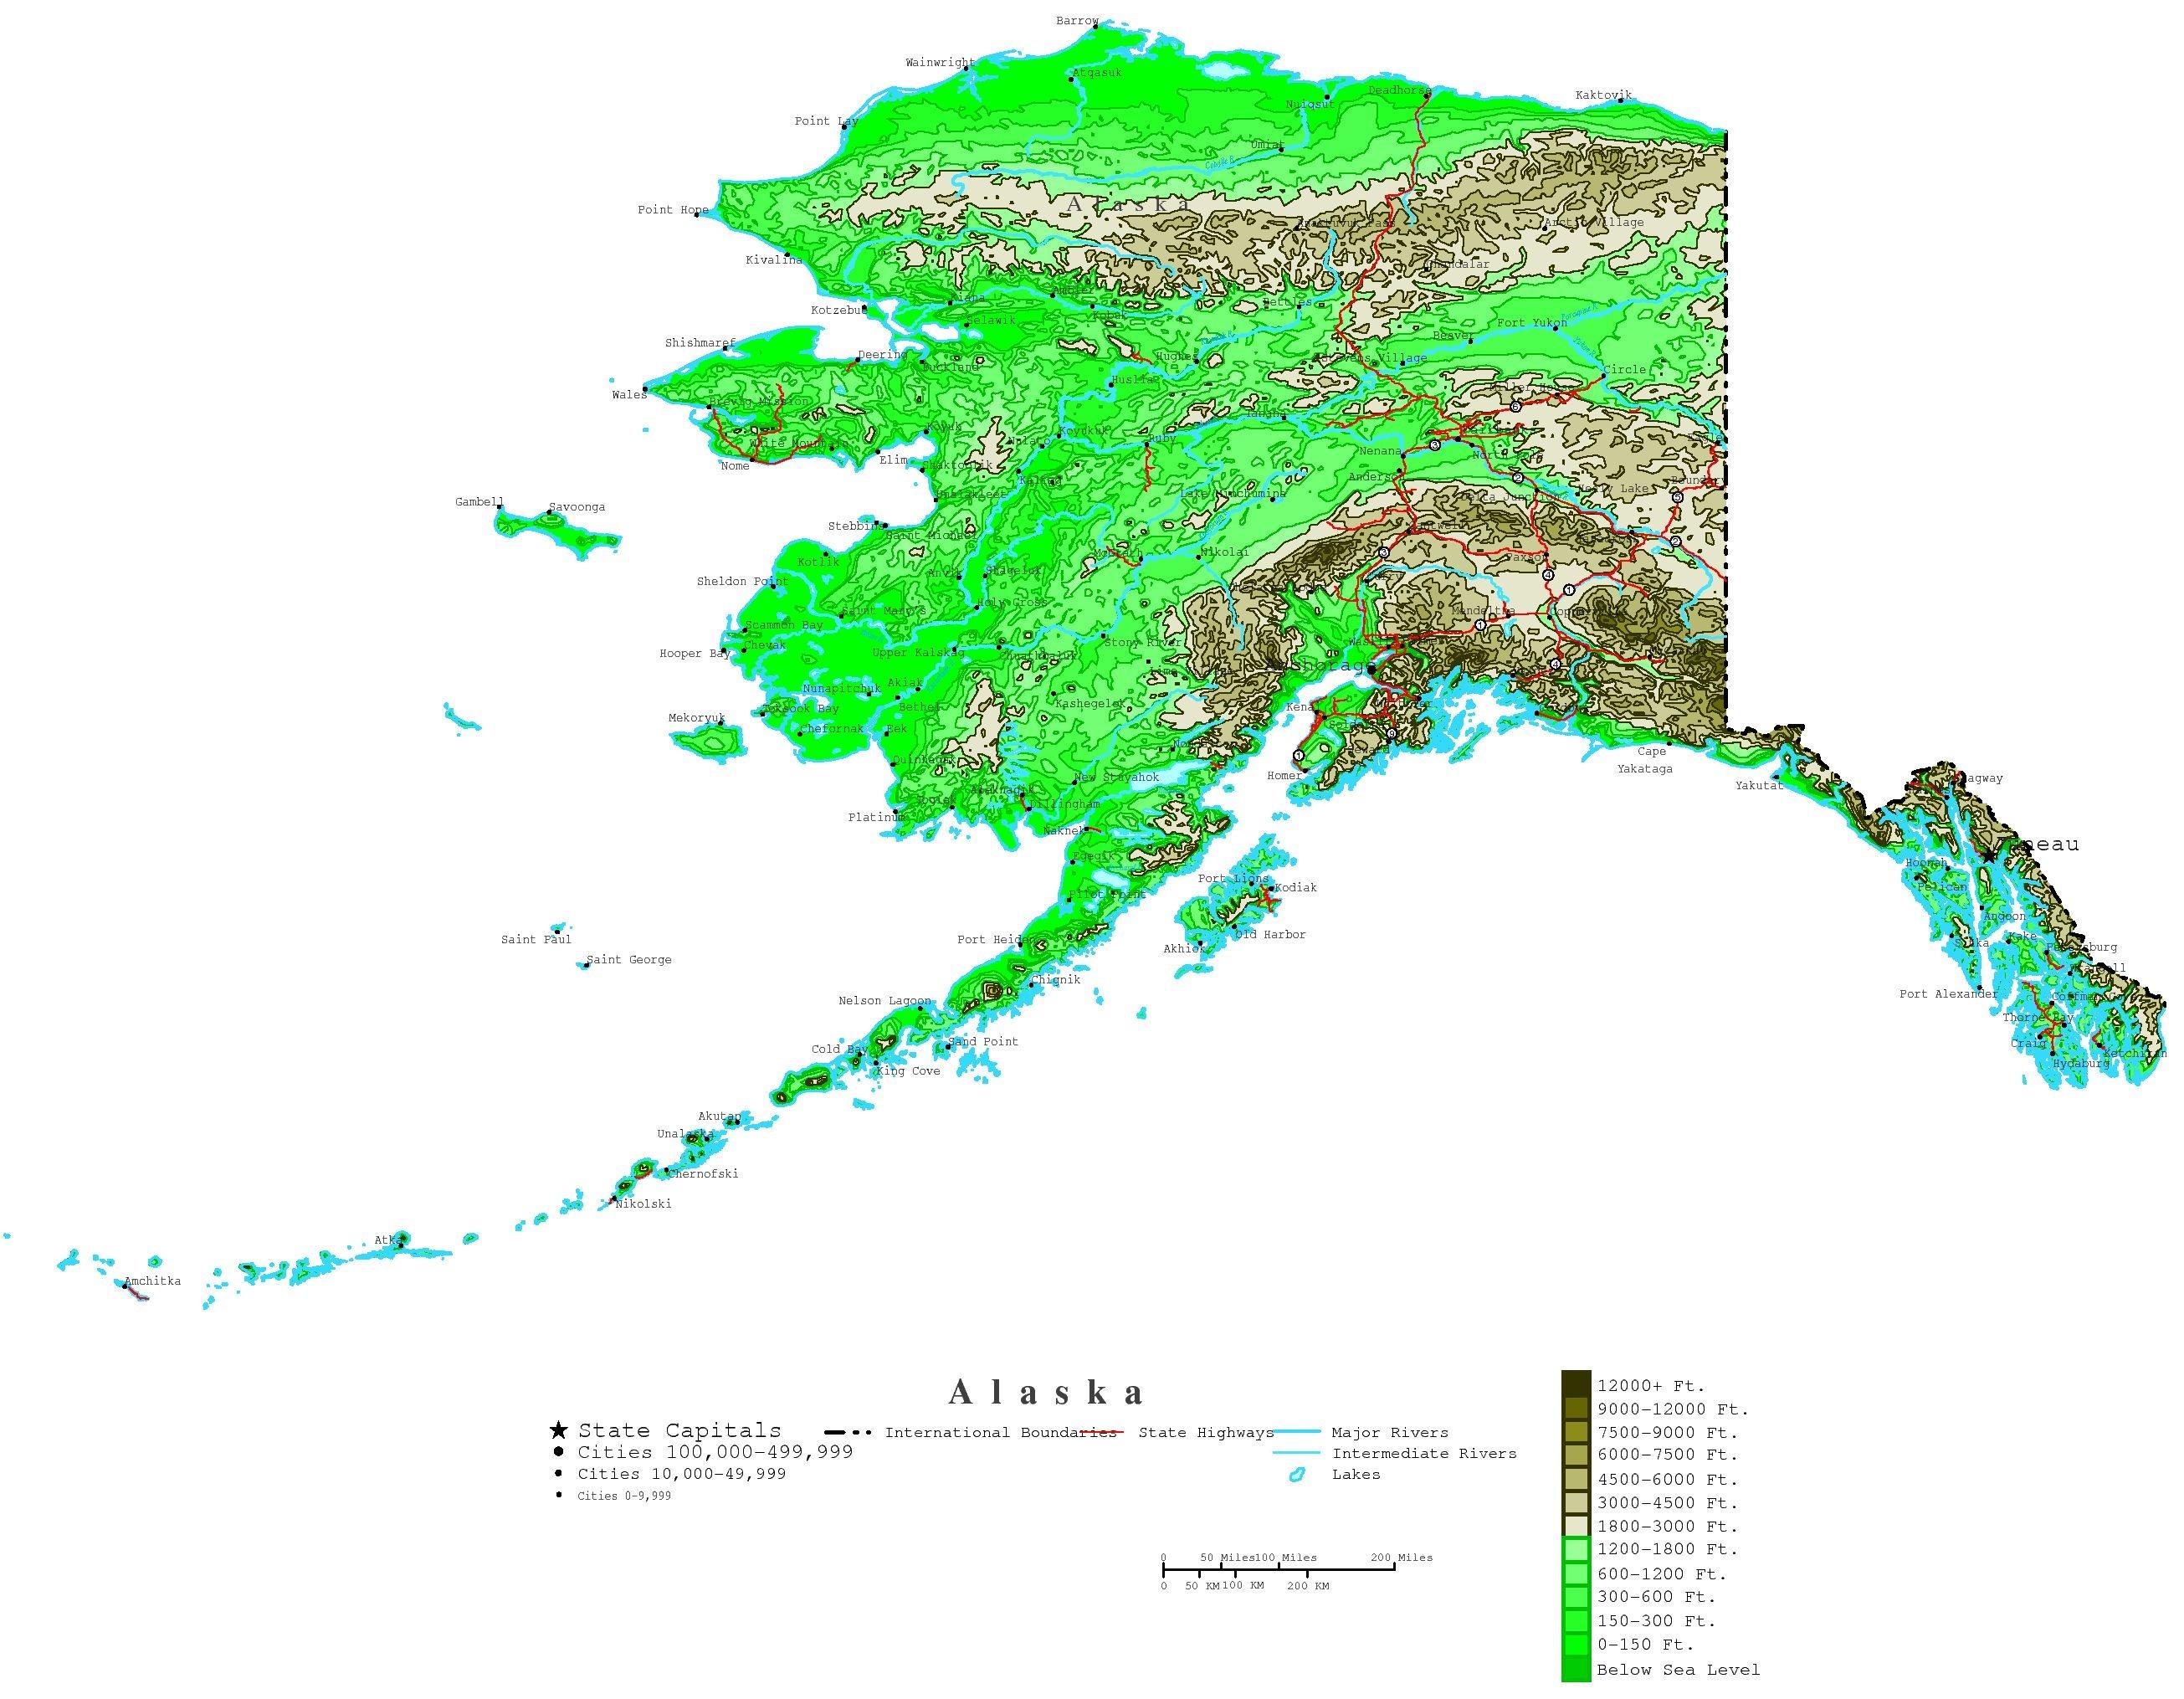 Printable Map Of Alaska And Travel Information | Download Free - Free Printable Pictures Of Alaska